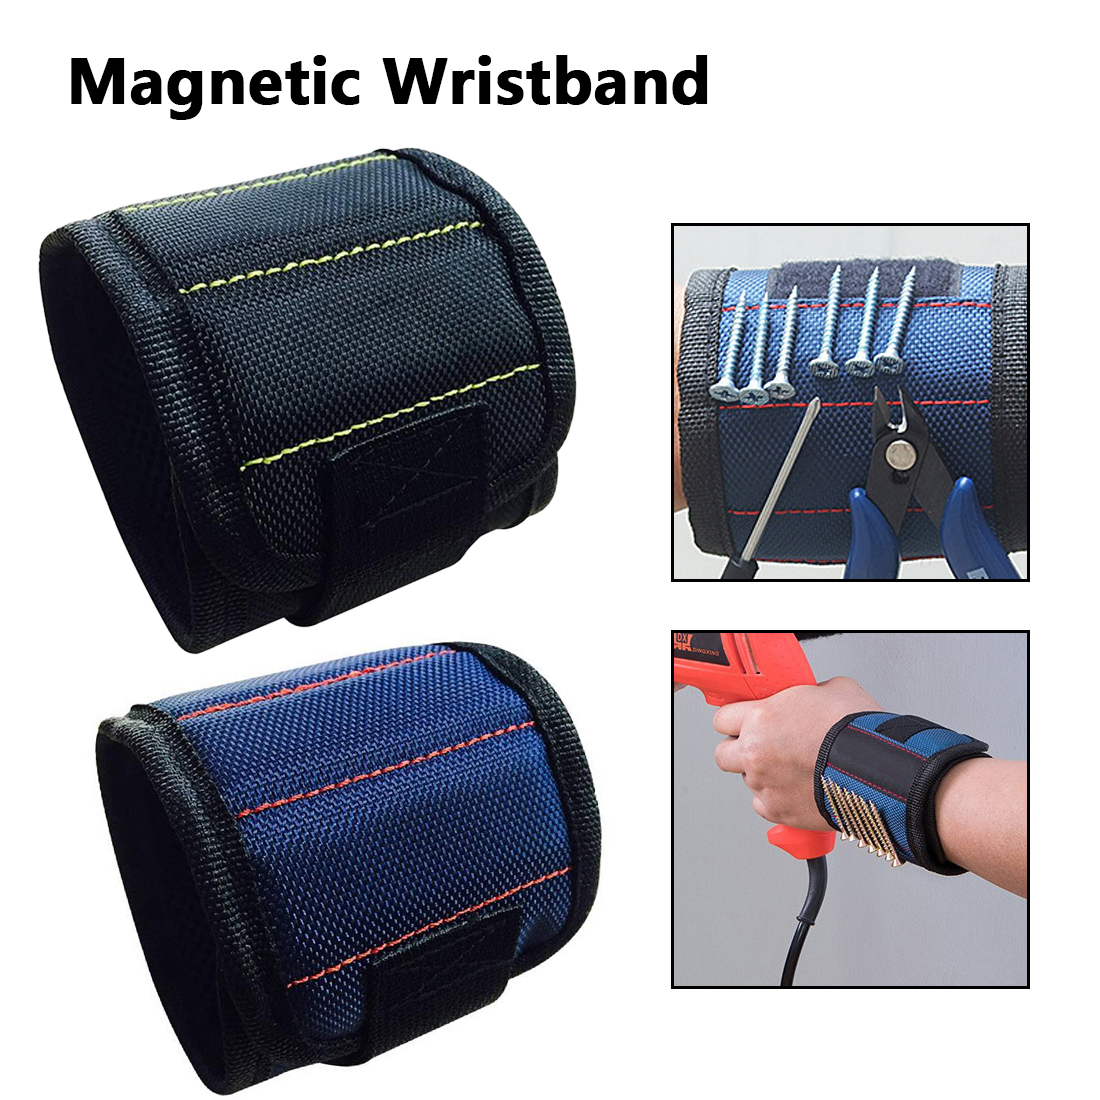 370mm Nylon Wrist Strong Magnetic Nail Screw Drill Bit Holder Wristband Holding Hand Tool Bag Bracelet Belt Car Auto Repair Kit